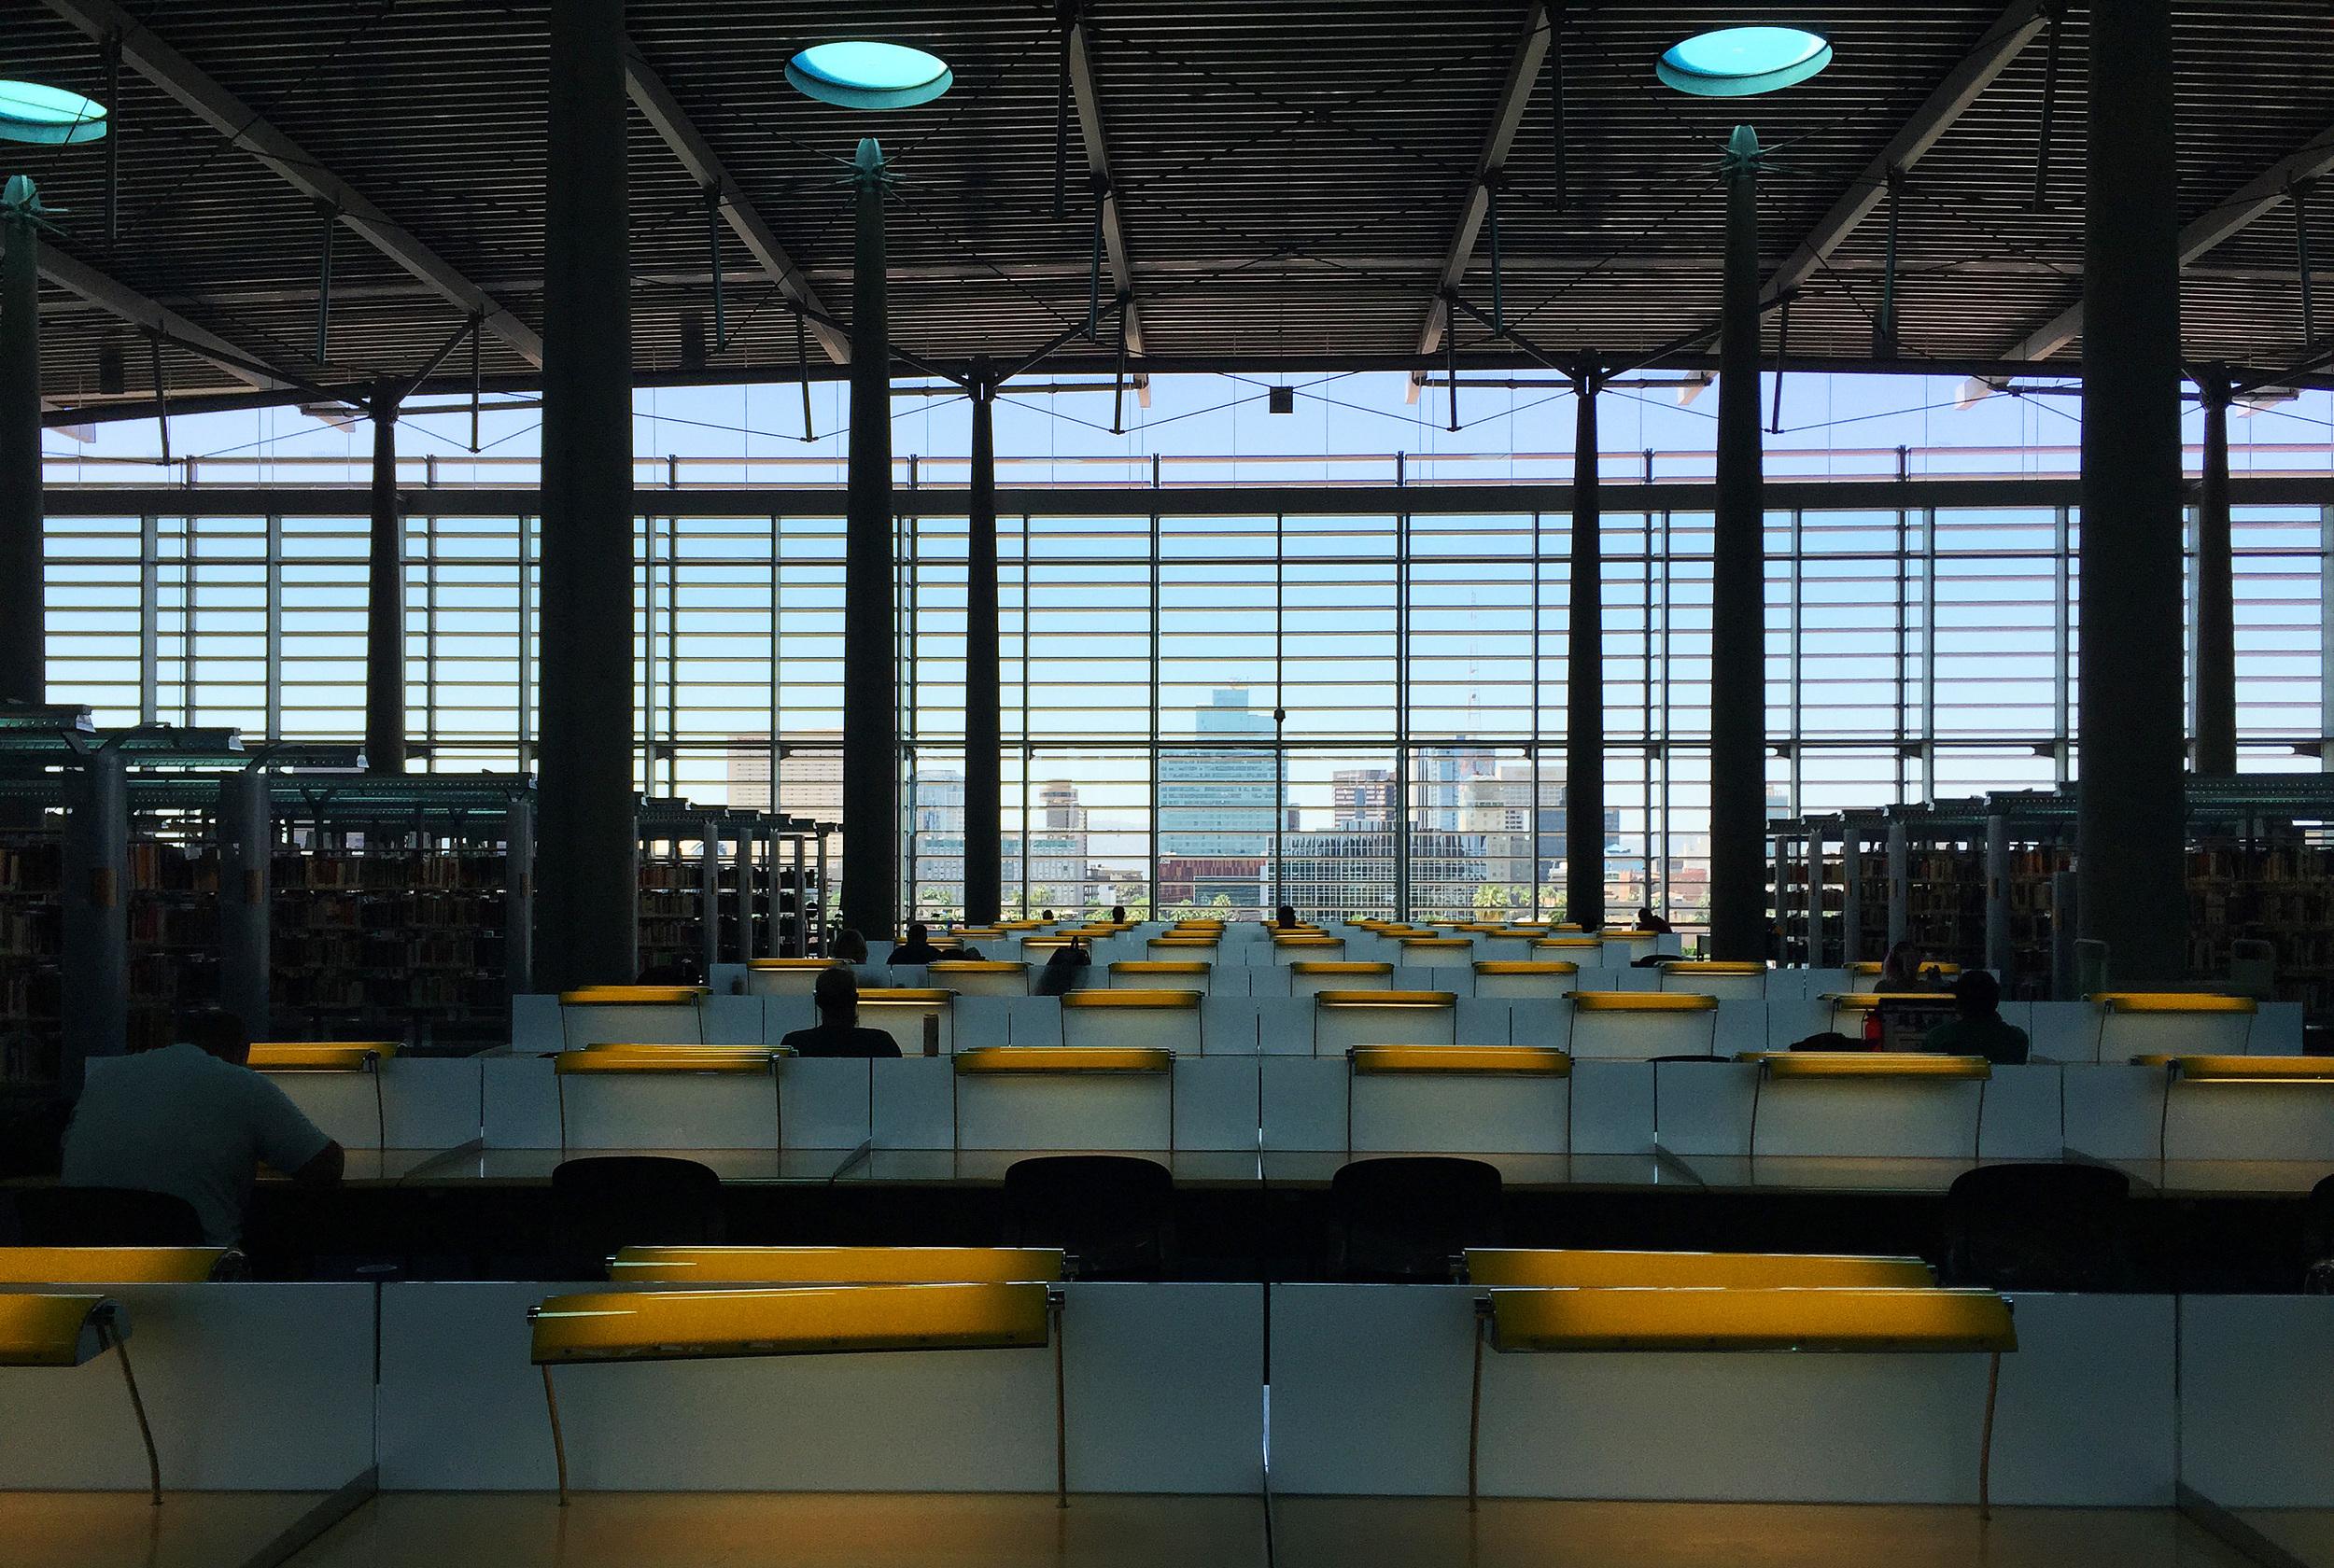 Burton Barr Public Library with circular skylights © Shannon Moore